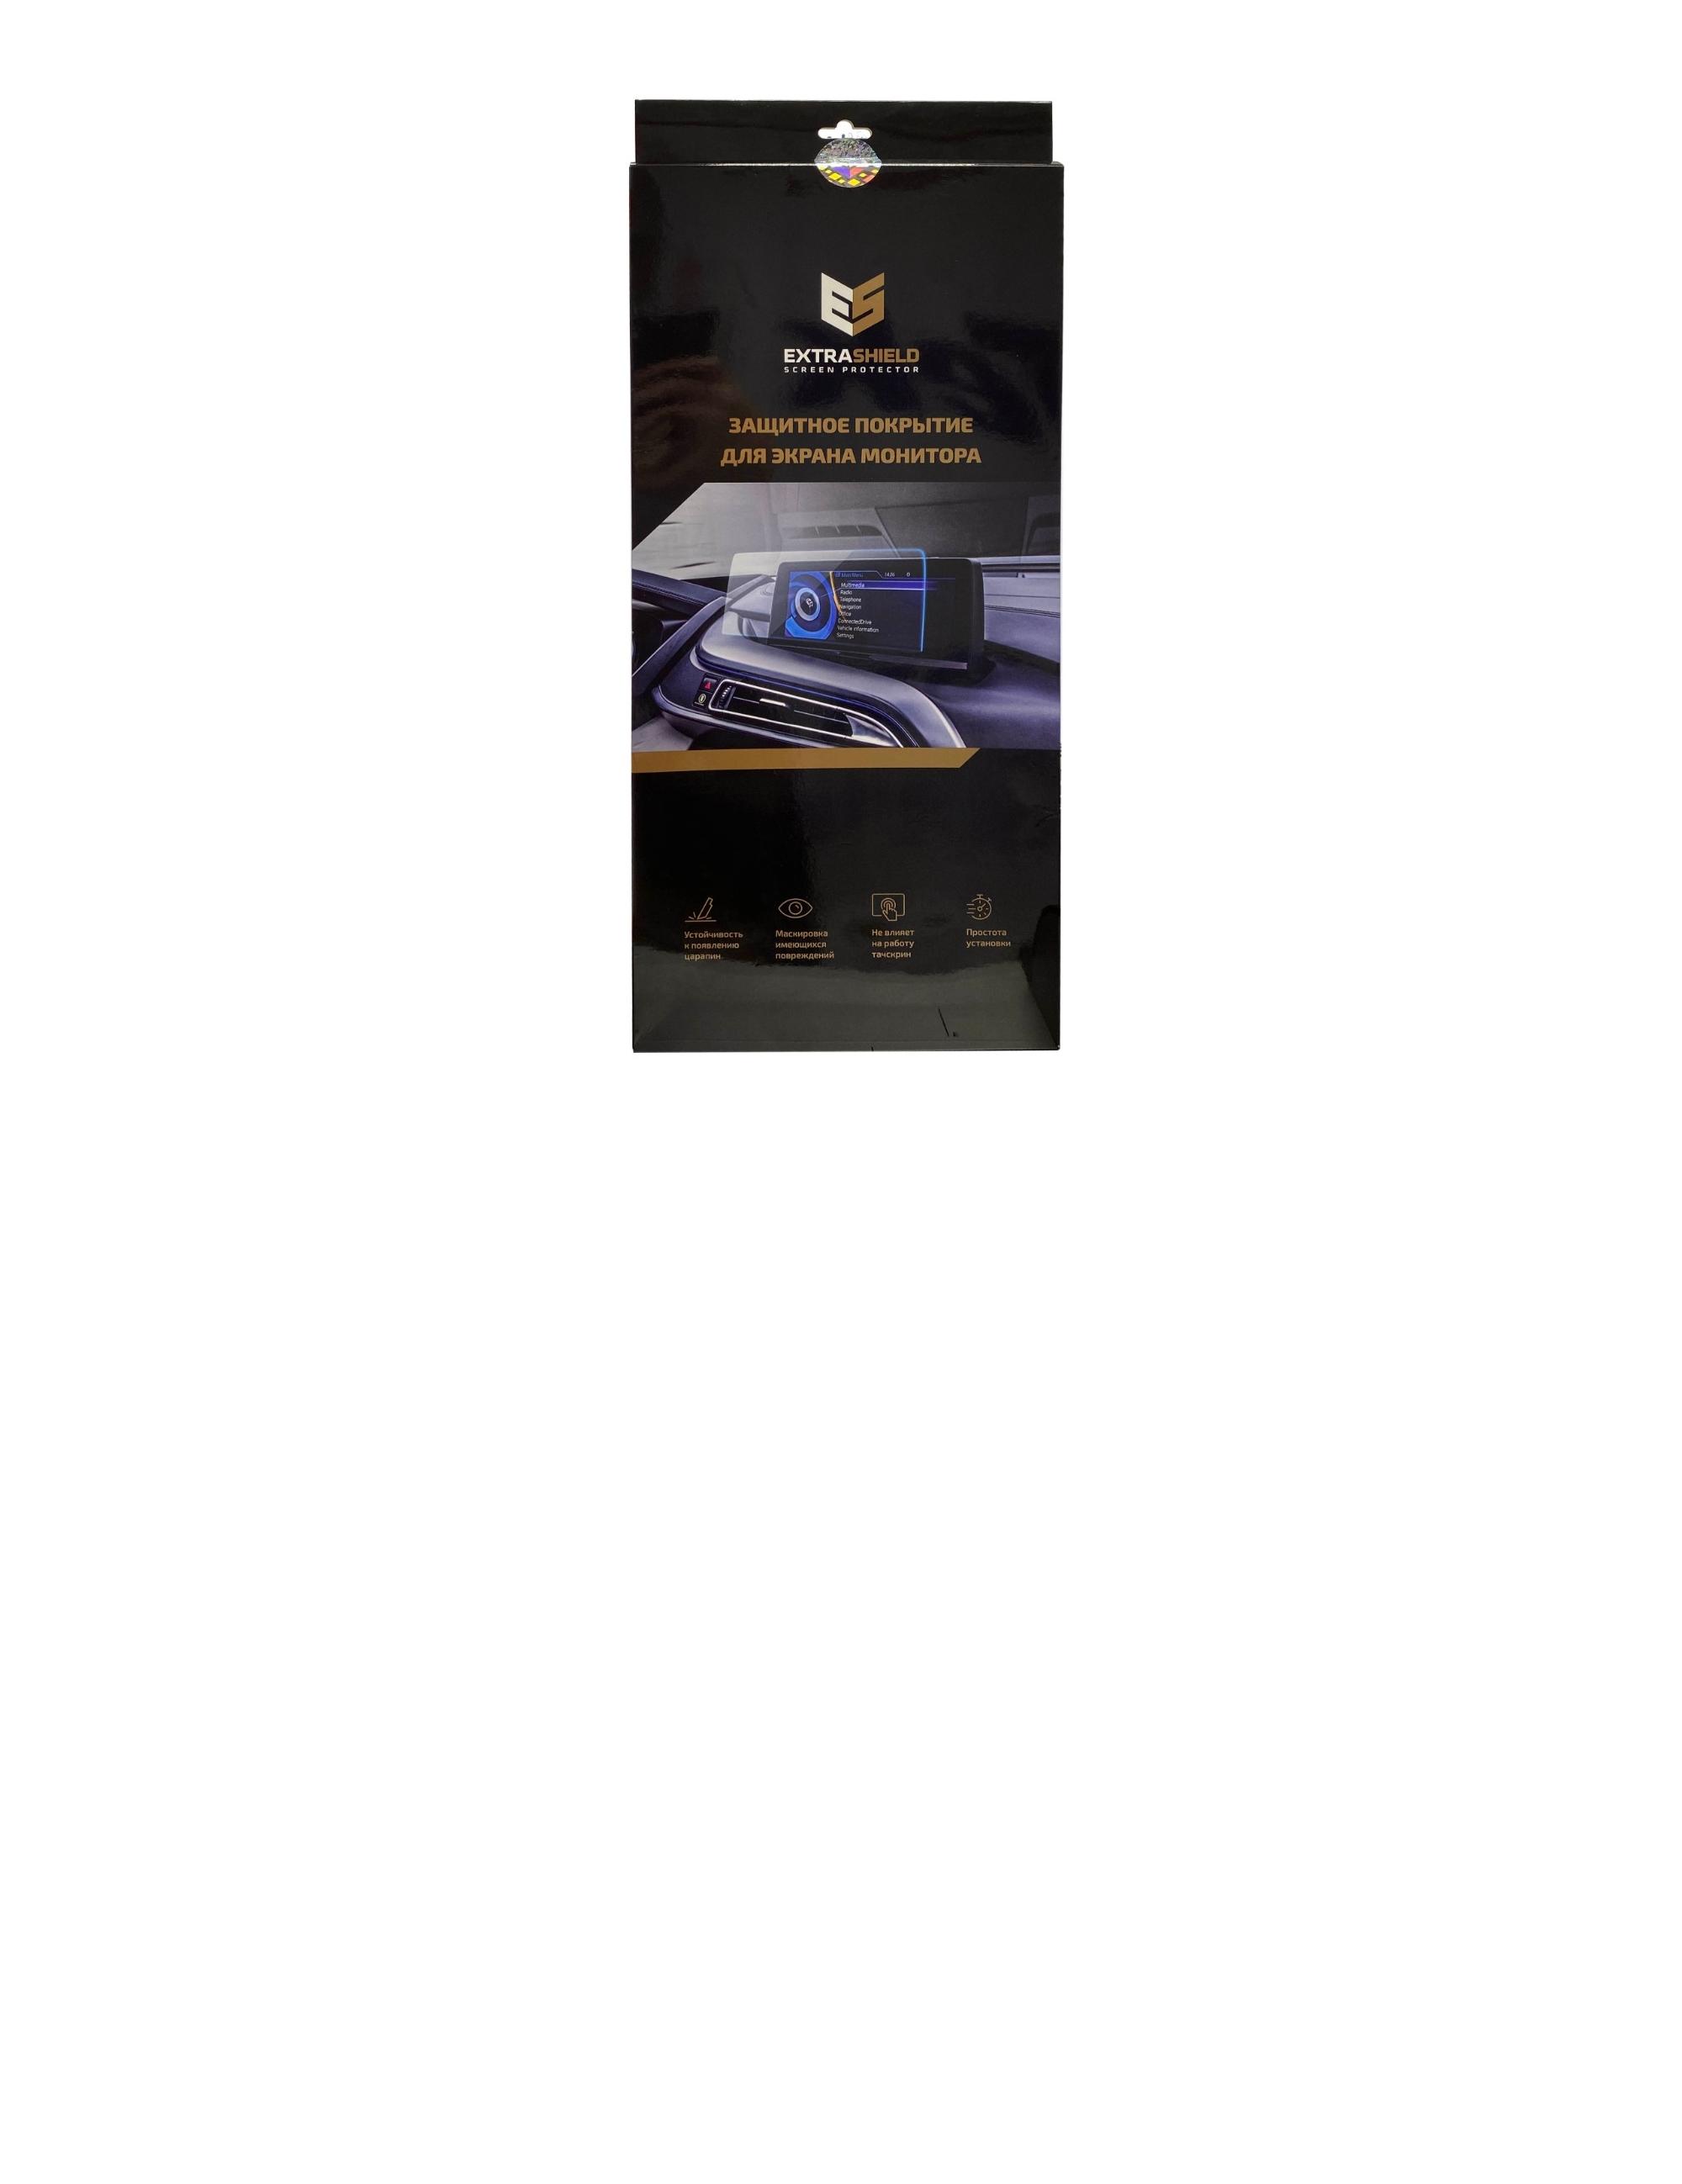 Mercedes-Benz V-class AMG рестайлинг (W447) 2014 - н.в. мультимедиа 7 Защитное стекло Глянец